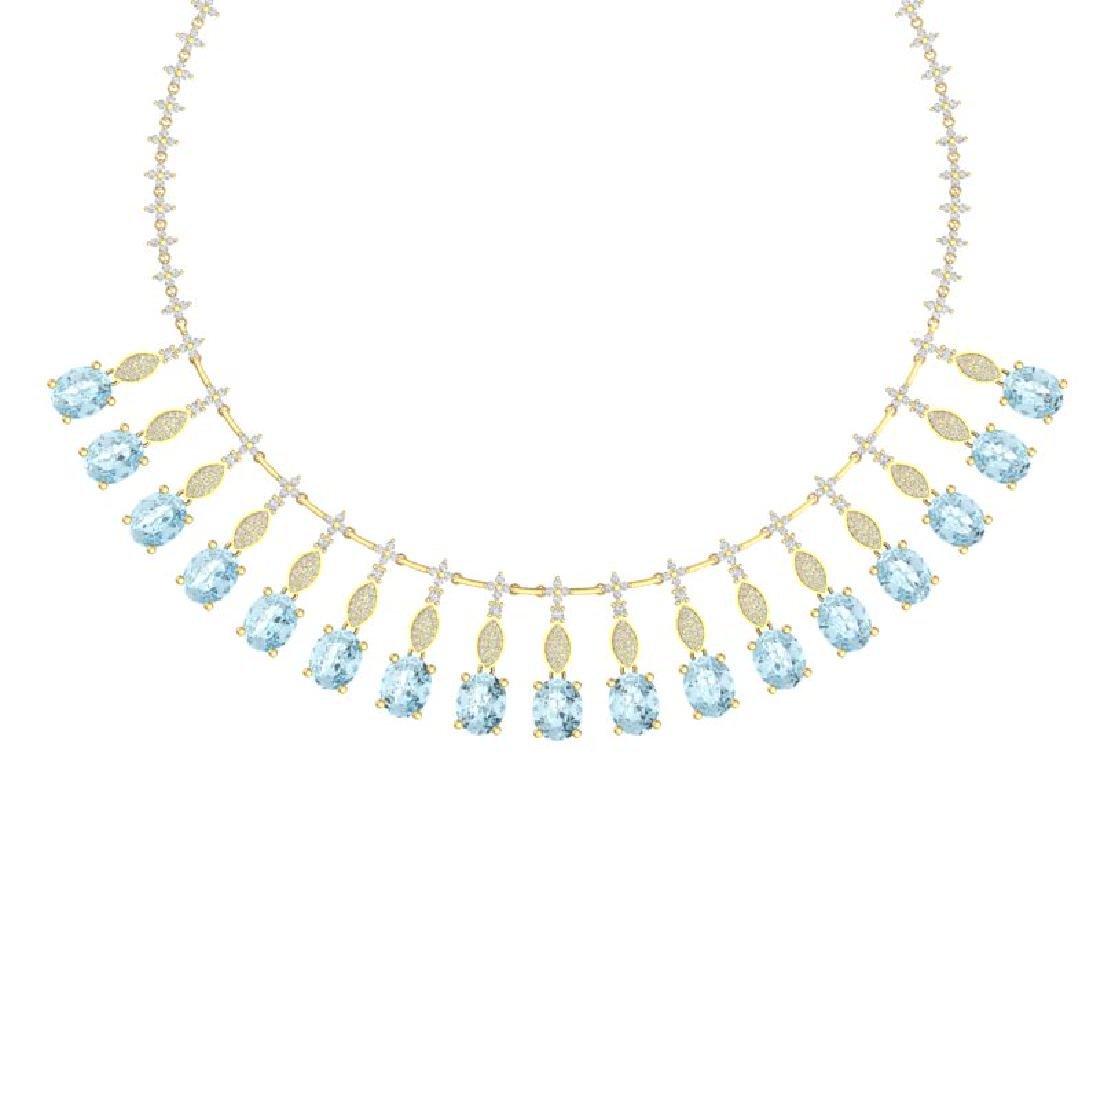 65.76 CTW Royalty Sky Topaz & VS Diamond Necklace 18K - 2